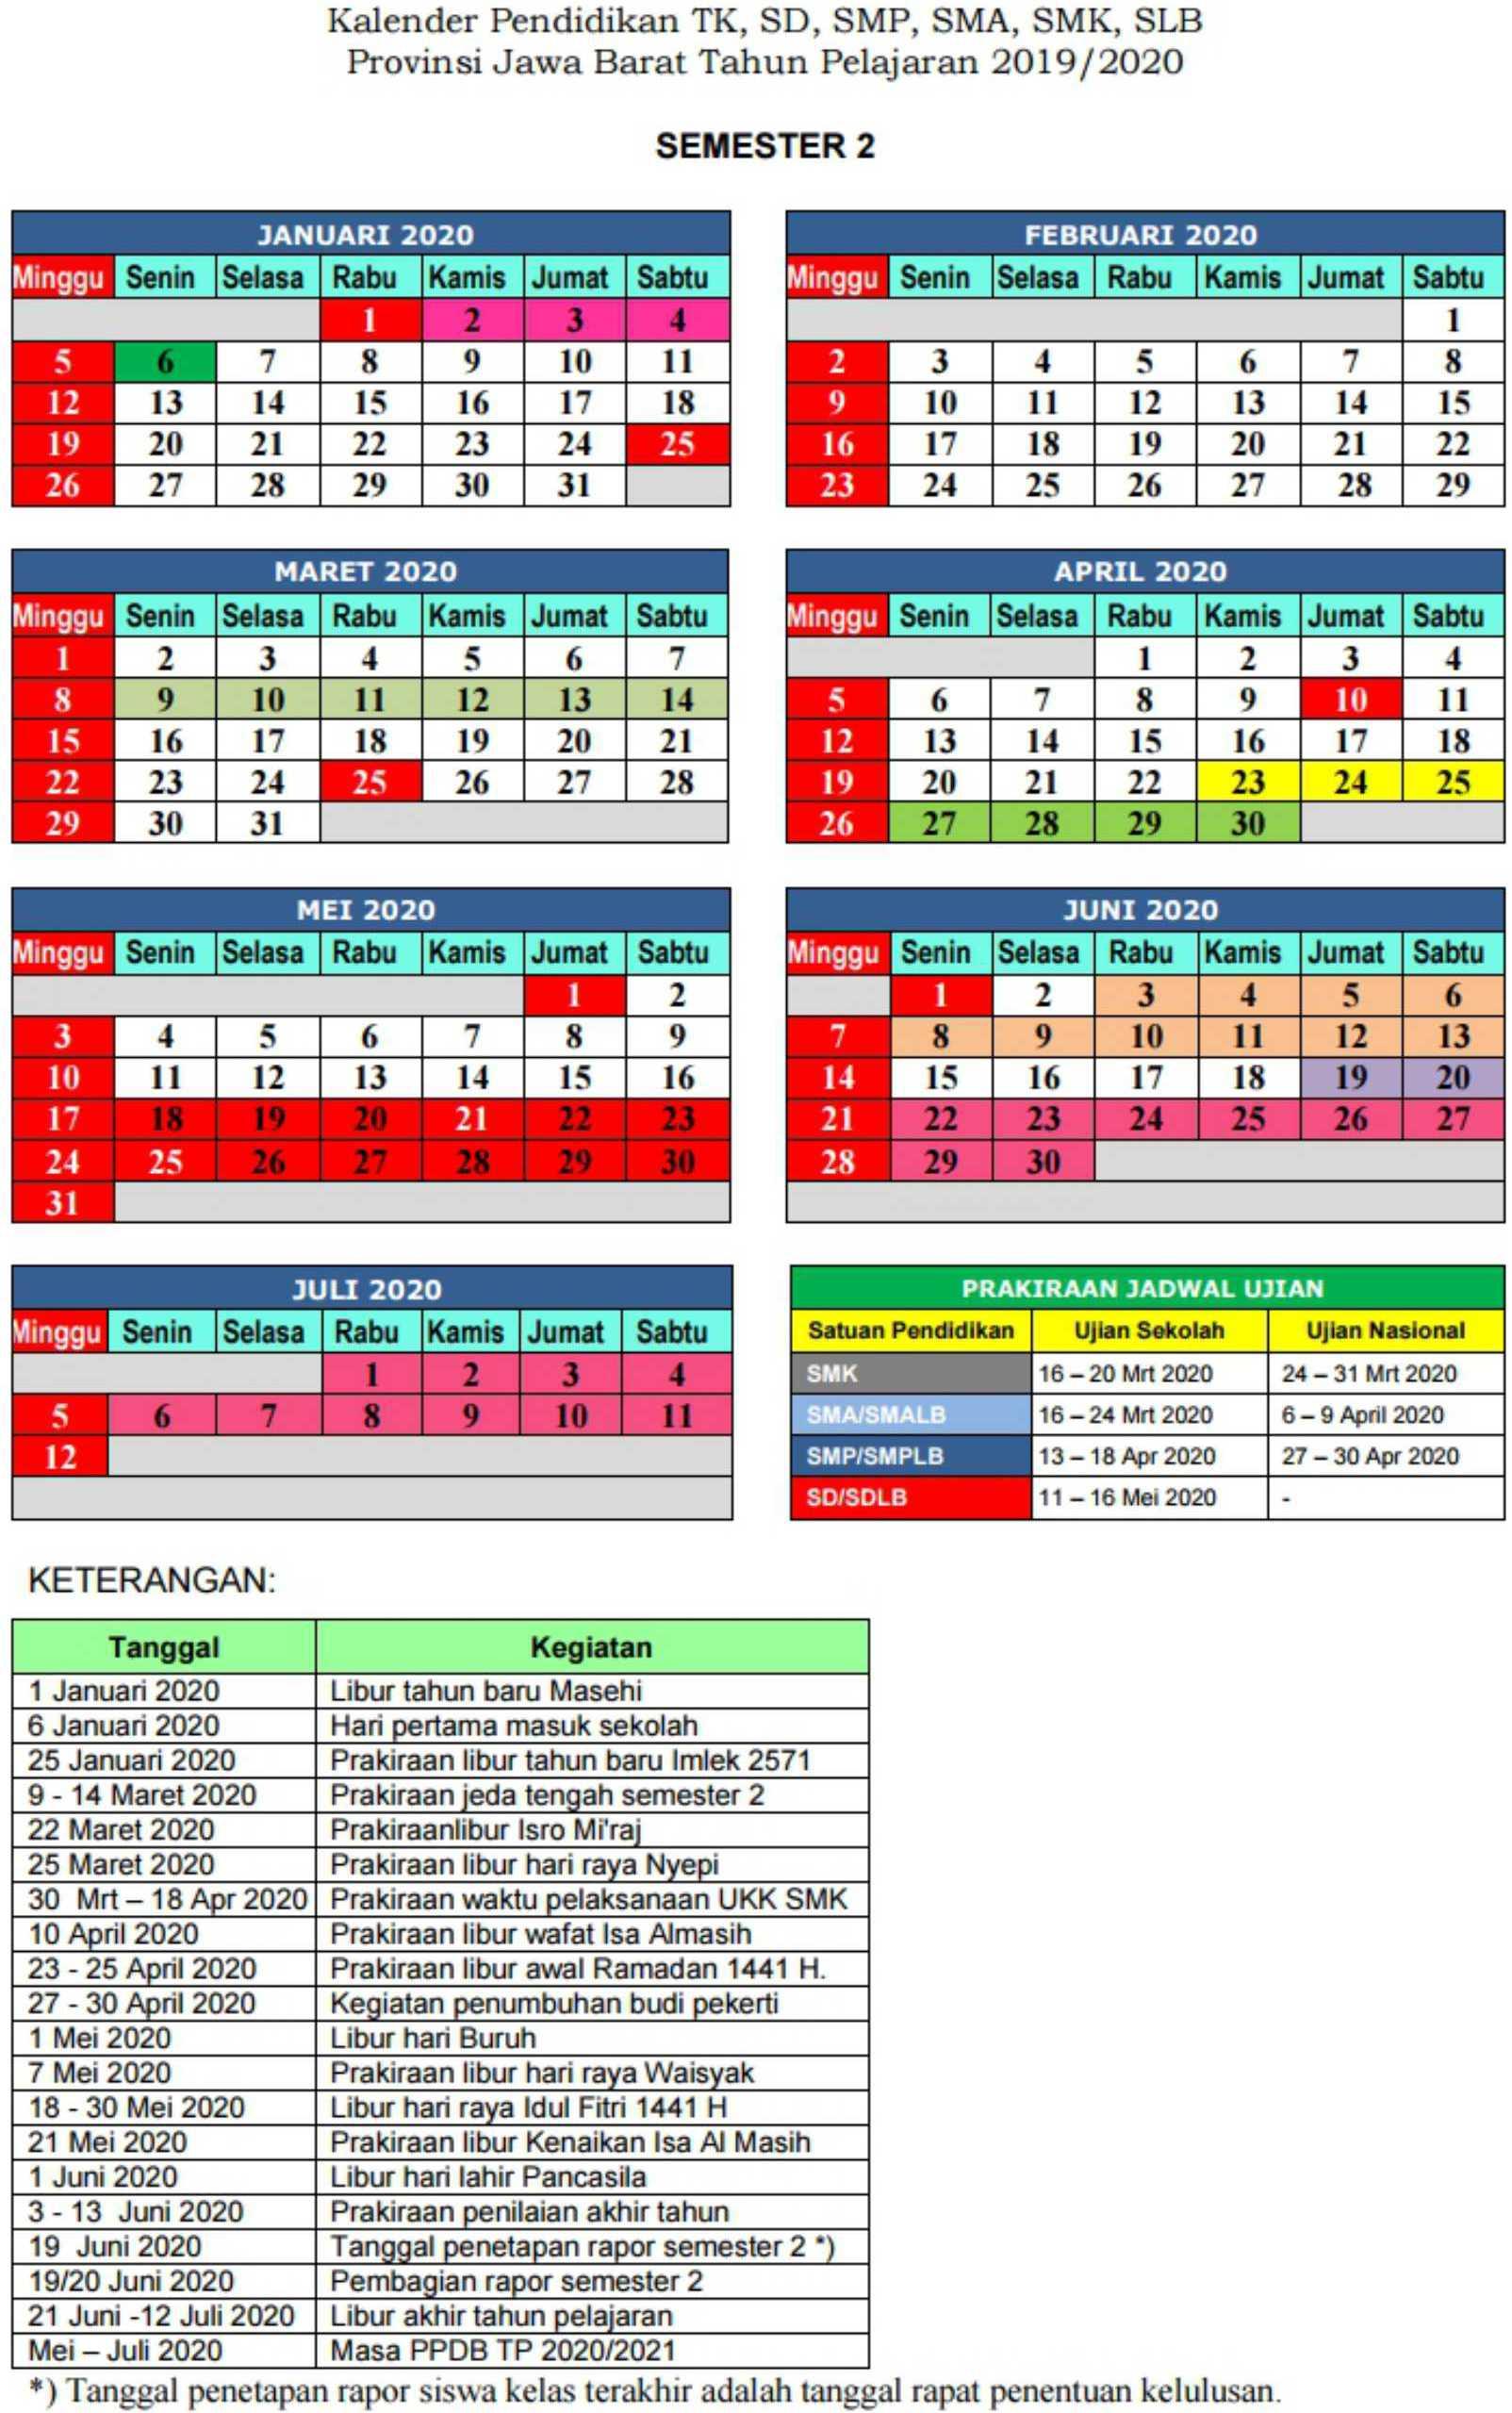 kalender pendidikan semester 2 TK SD SMP SMA SMK SLB pronvinsi jawa barat tahun pelajaran 2019-2020